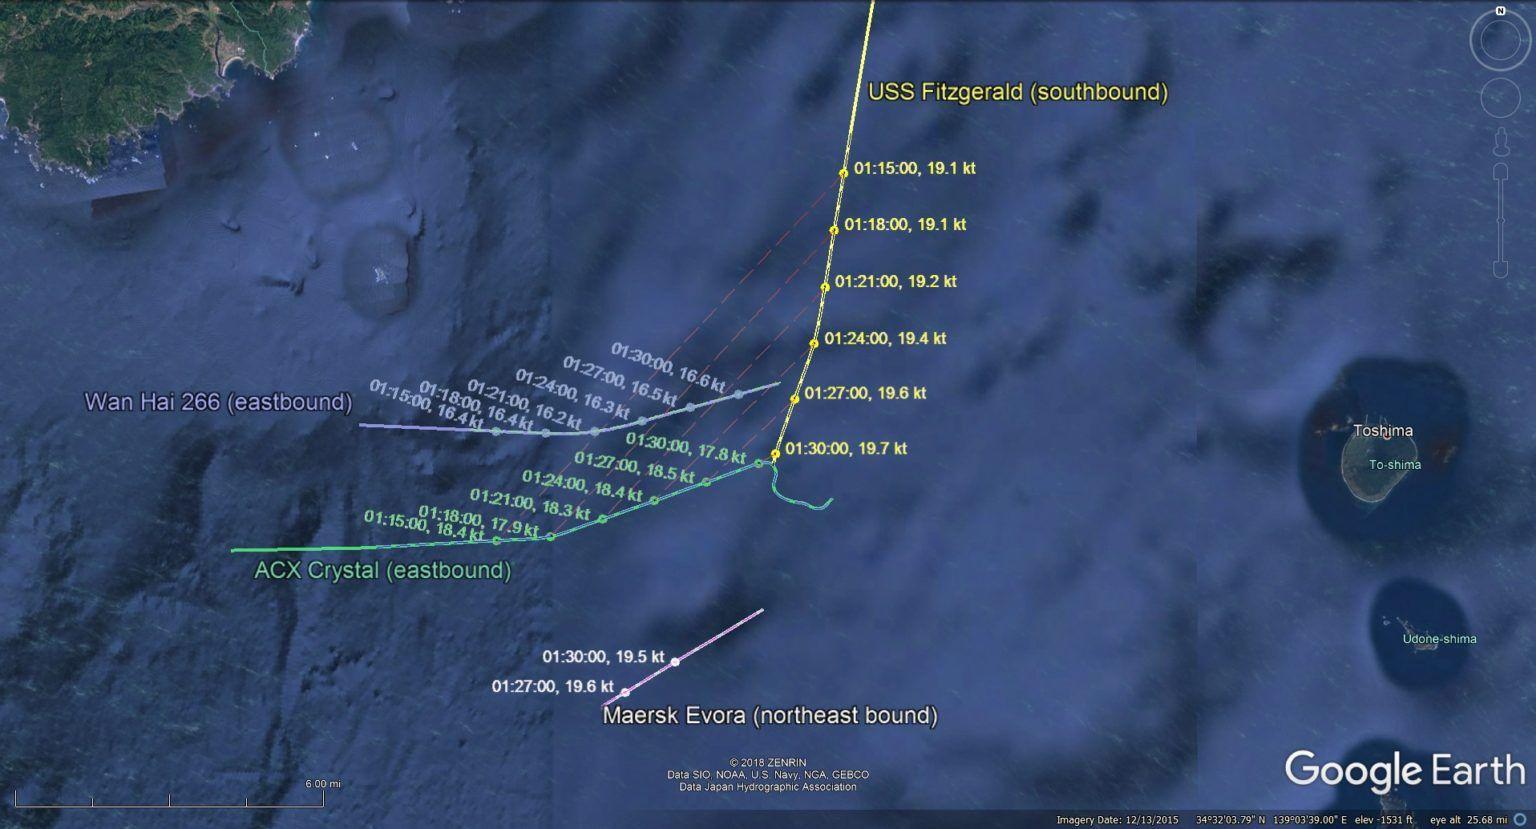 NTSB Says Navy Bridge Team Failure Caused USS Fitzgerald